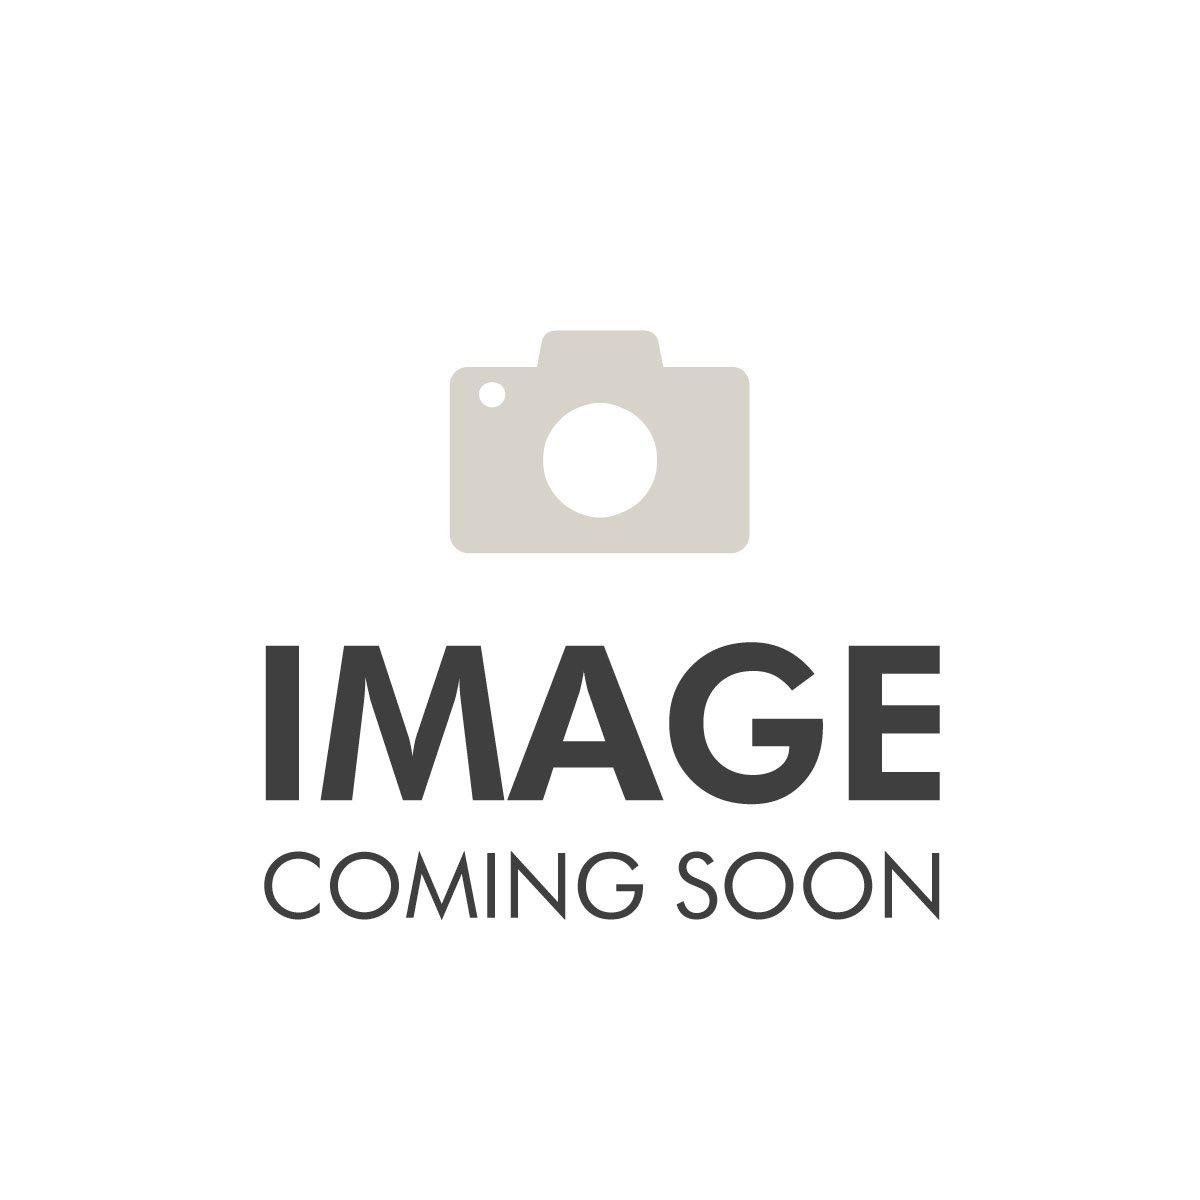 Thierry Mugler Mugler Cologne 100ml EDT Spray